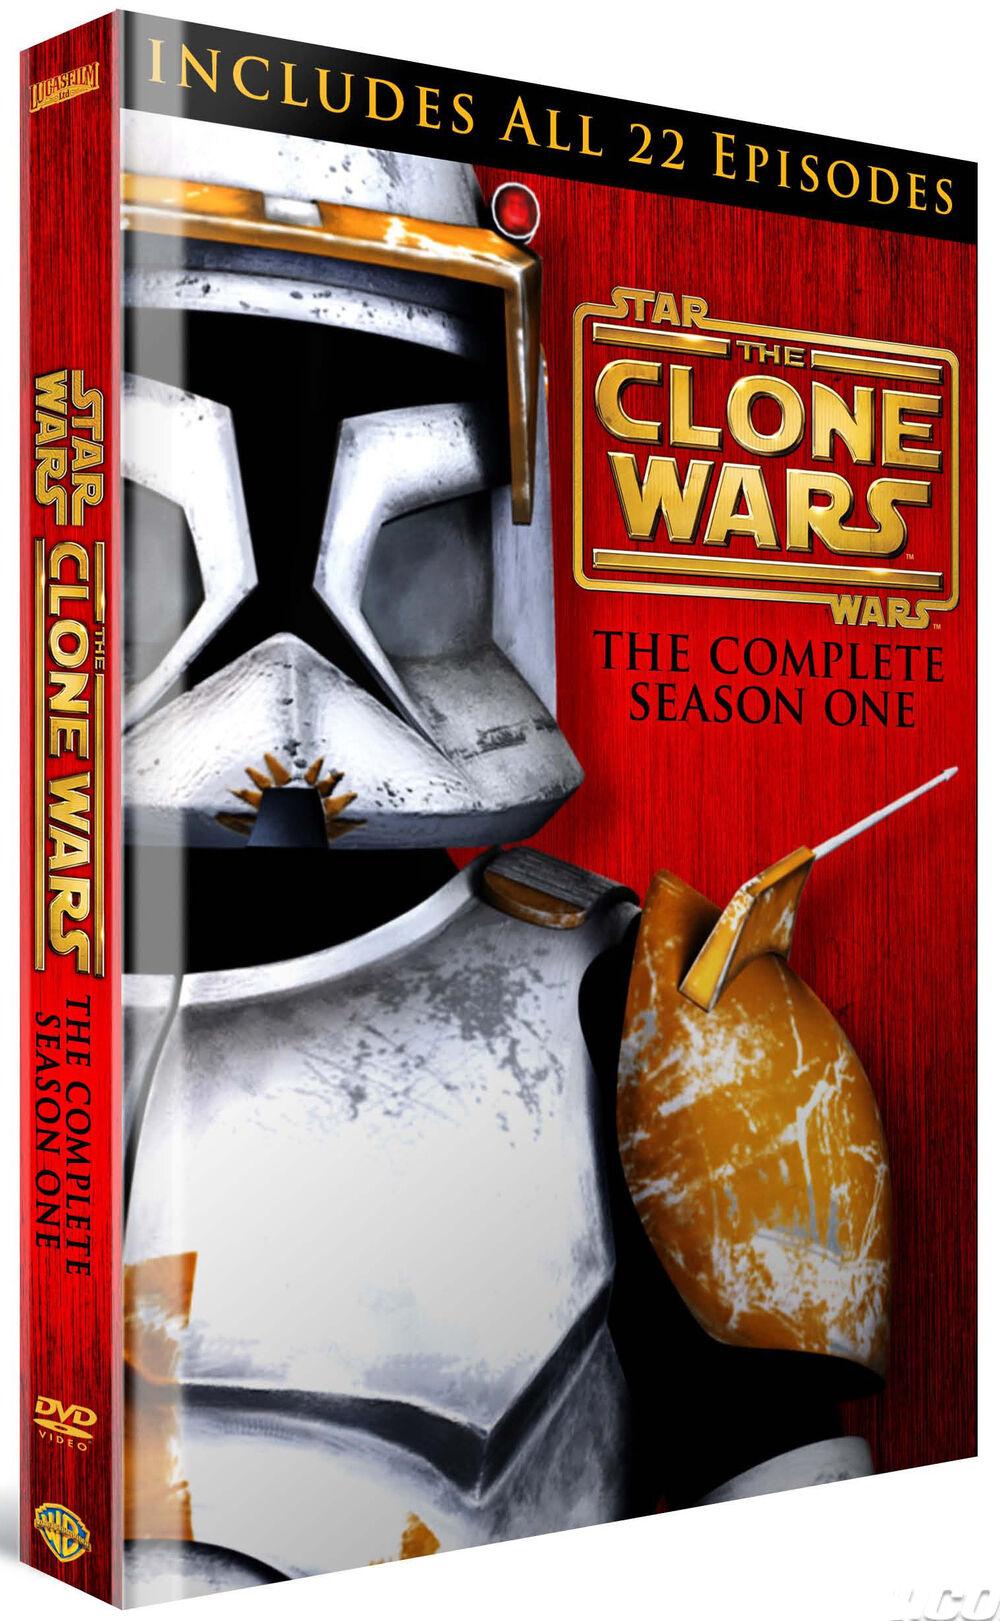 Star Wars: The Clone Wars Season One